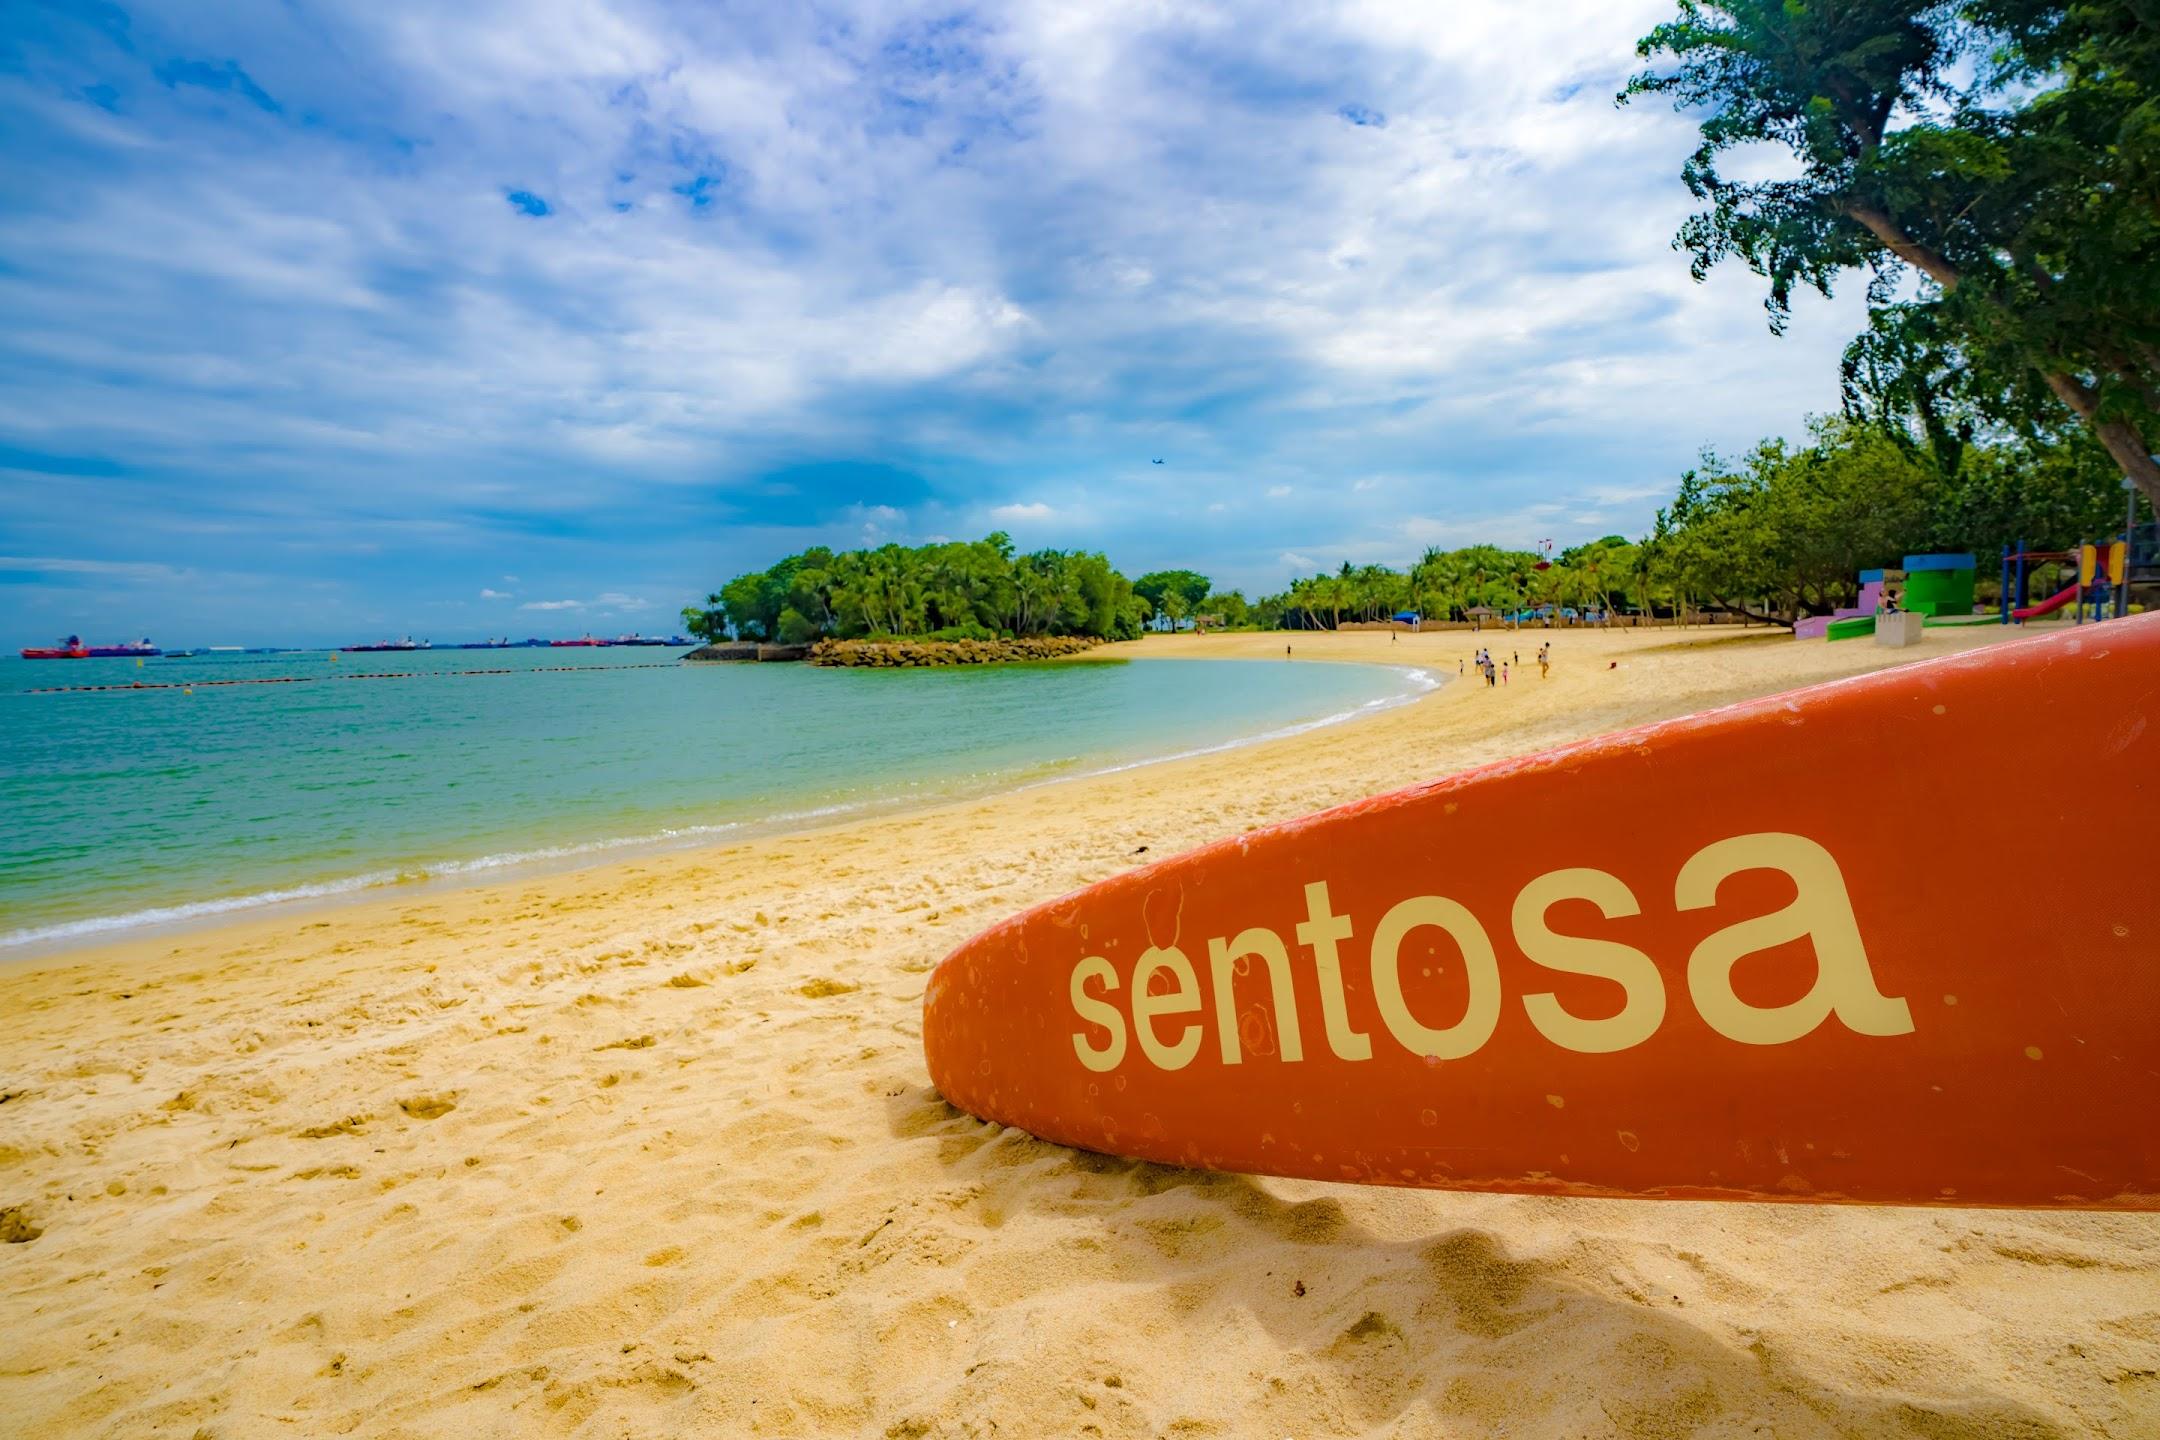 Singapore Sentosa Beach2